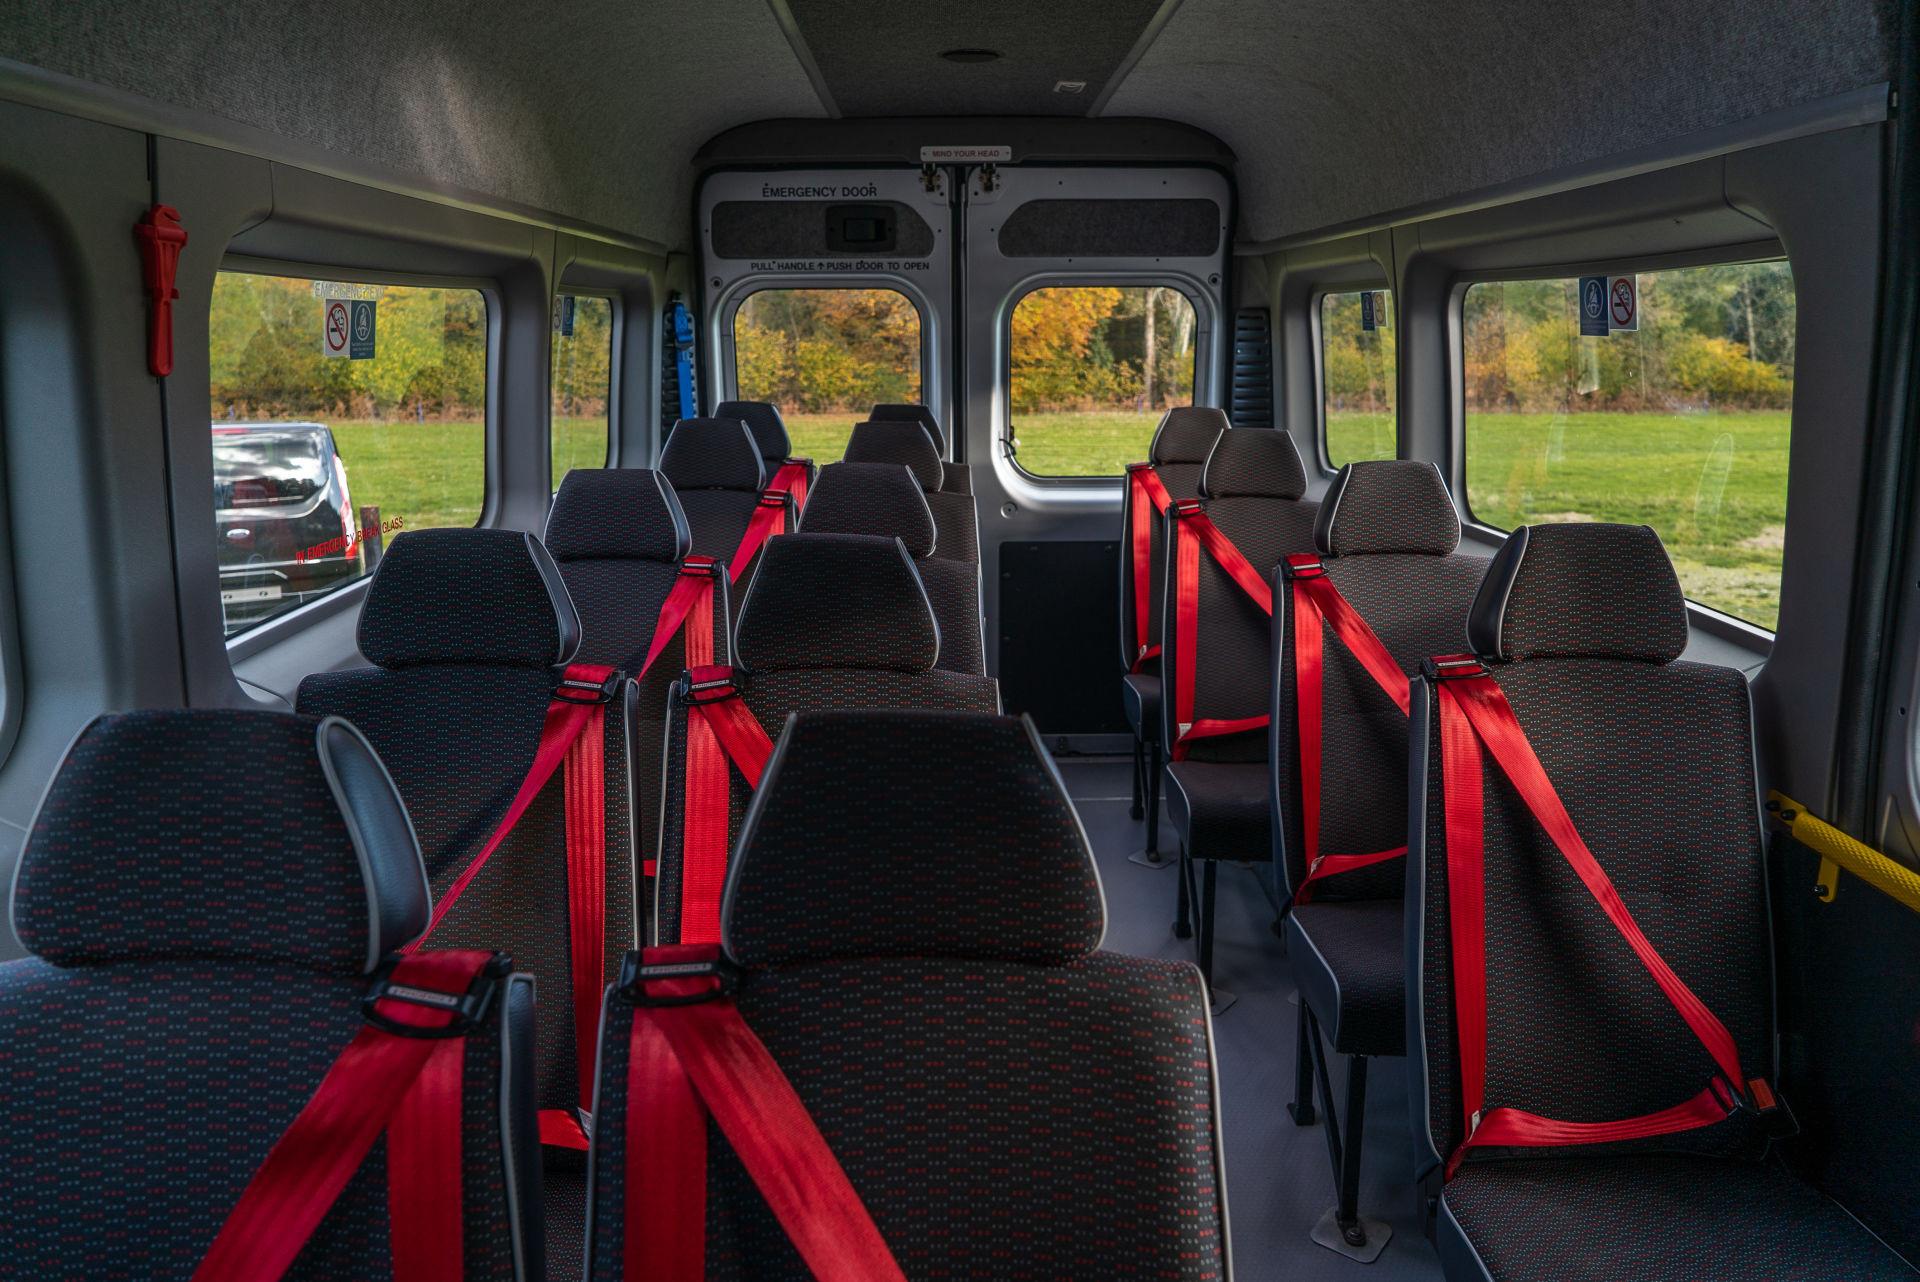 2015 Peugeot Boxer 17 Seater Accessible Minibus for Sale - Image 3